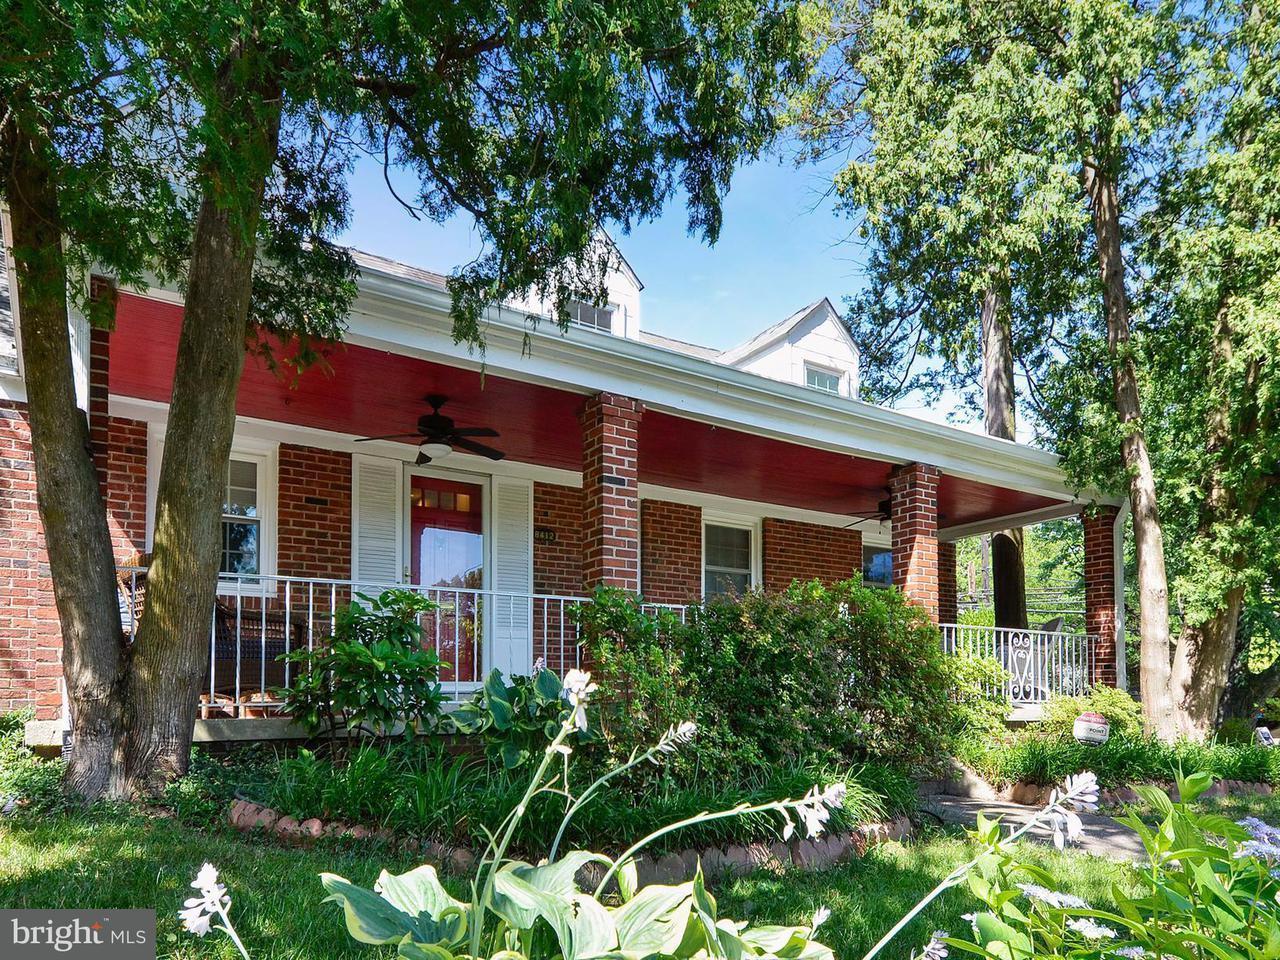 Single Family Home for Sale at 8412 CEDAR Street 8412 CEDAR Street Silver Spring, Maryland 20910 United States